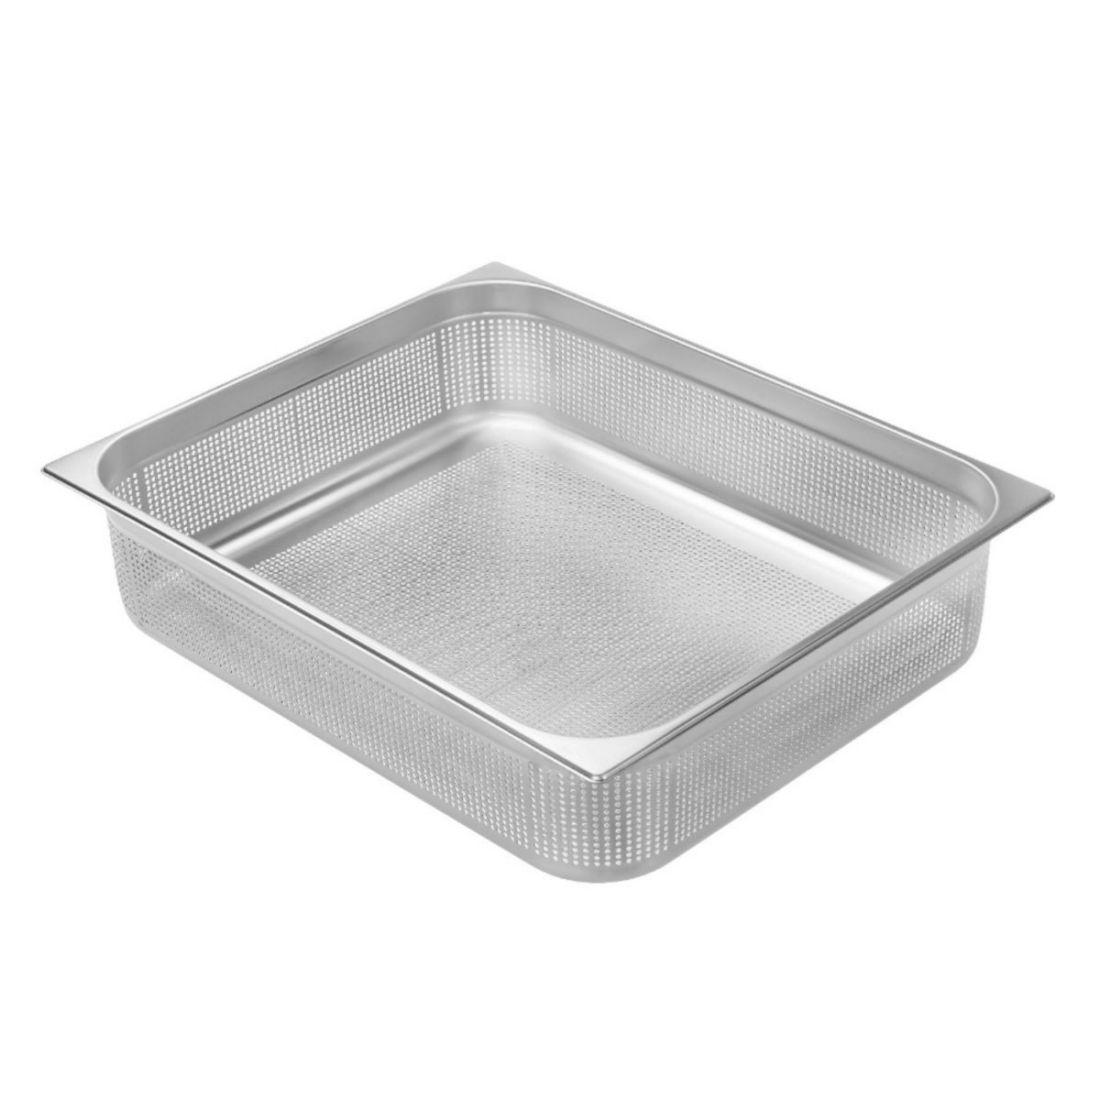 Gastronádoba Profi děrovaná GN 2/1 040 mm